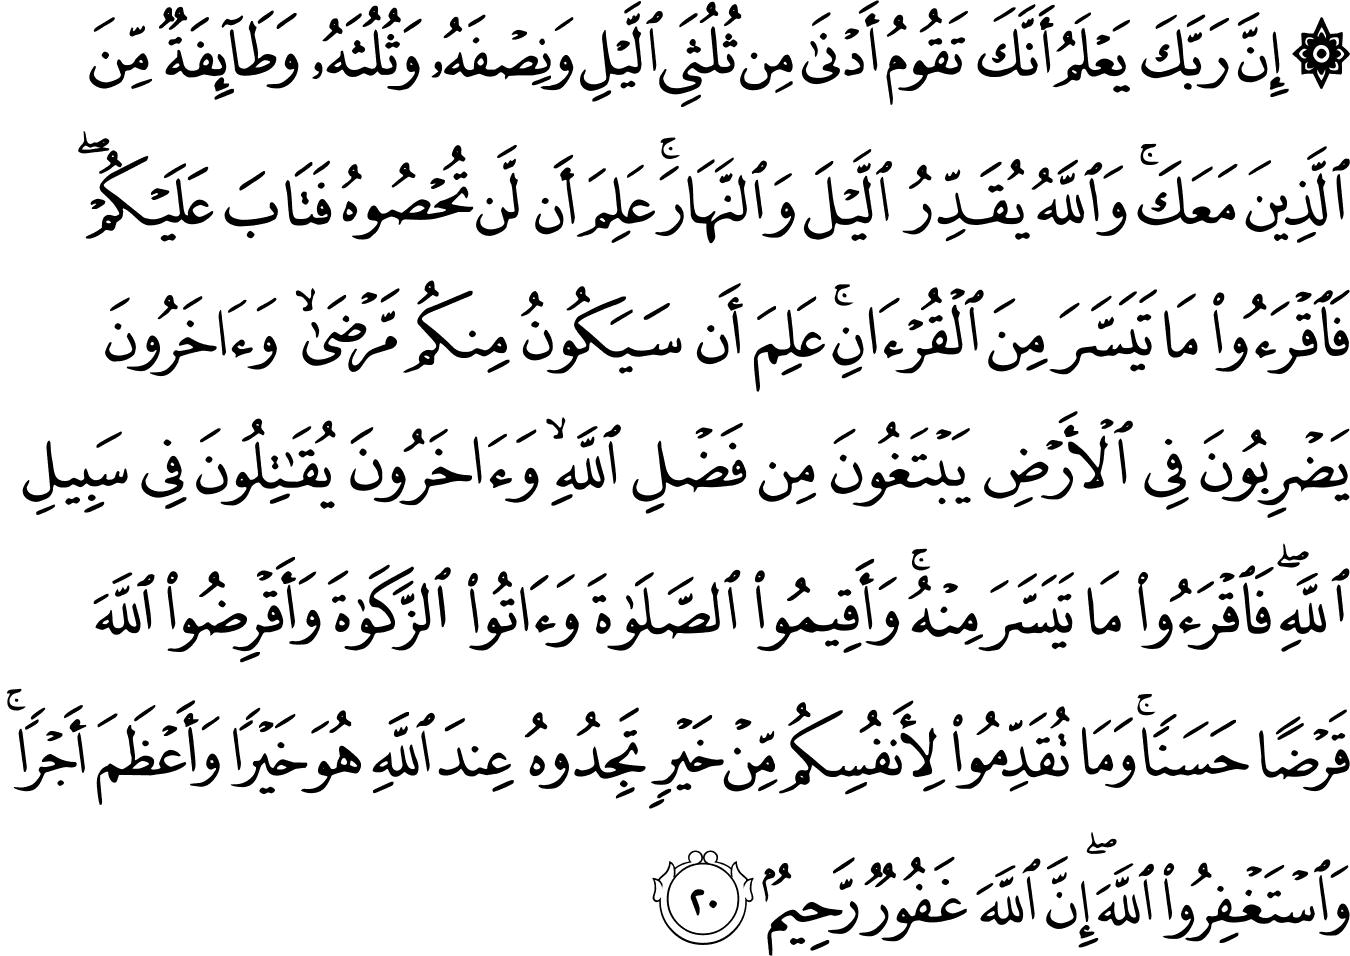 Surat Al Muzzammil 7320 The Noble Quran القرآن الكريم